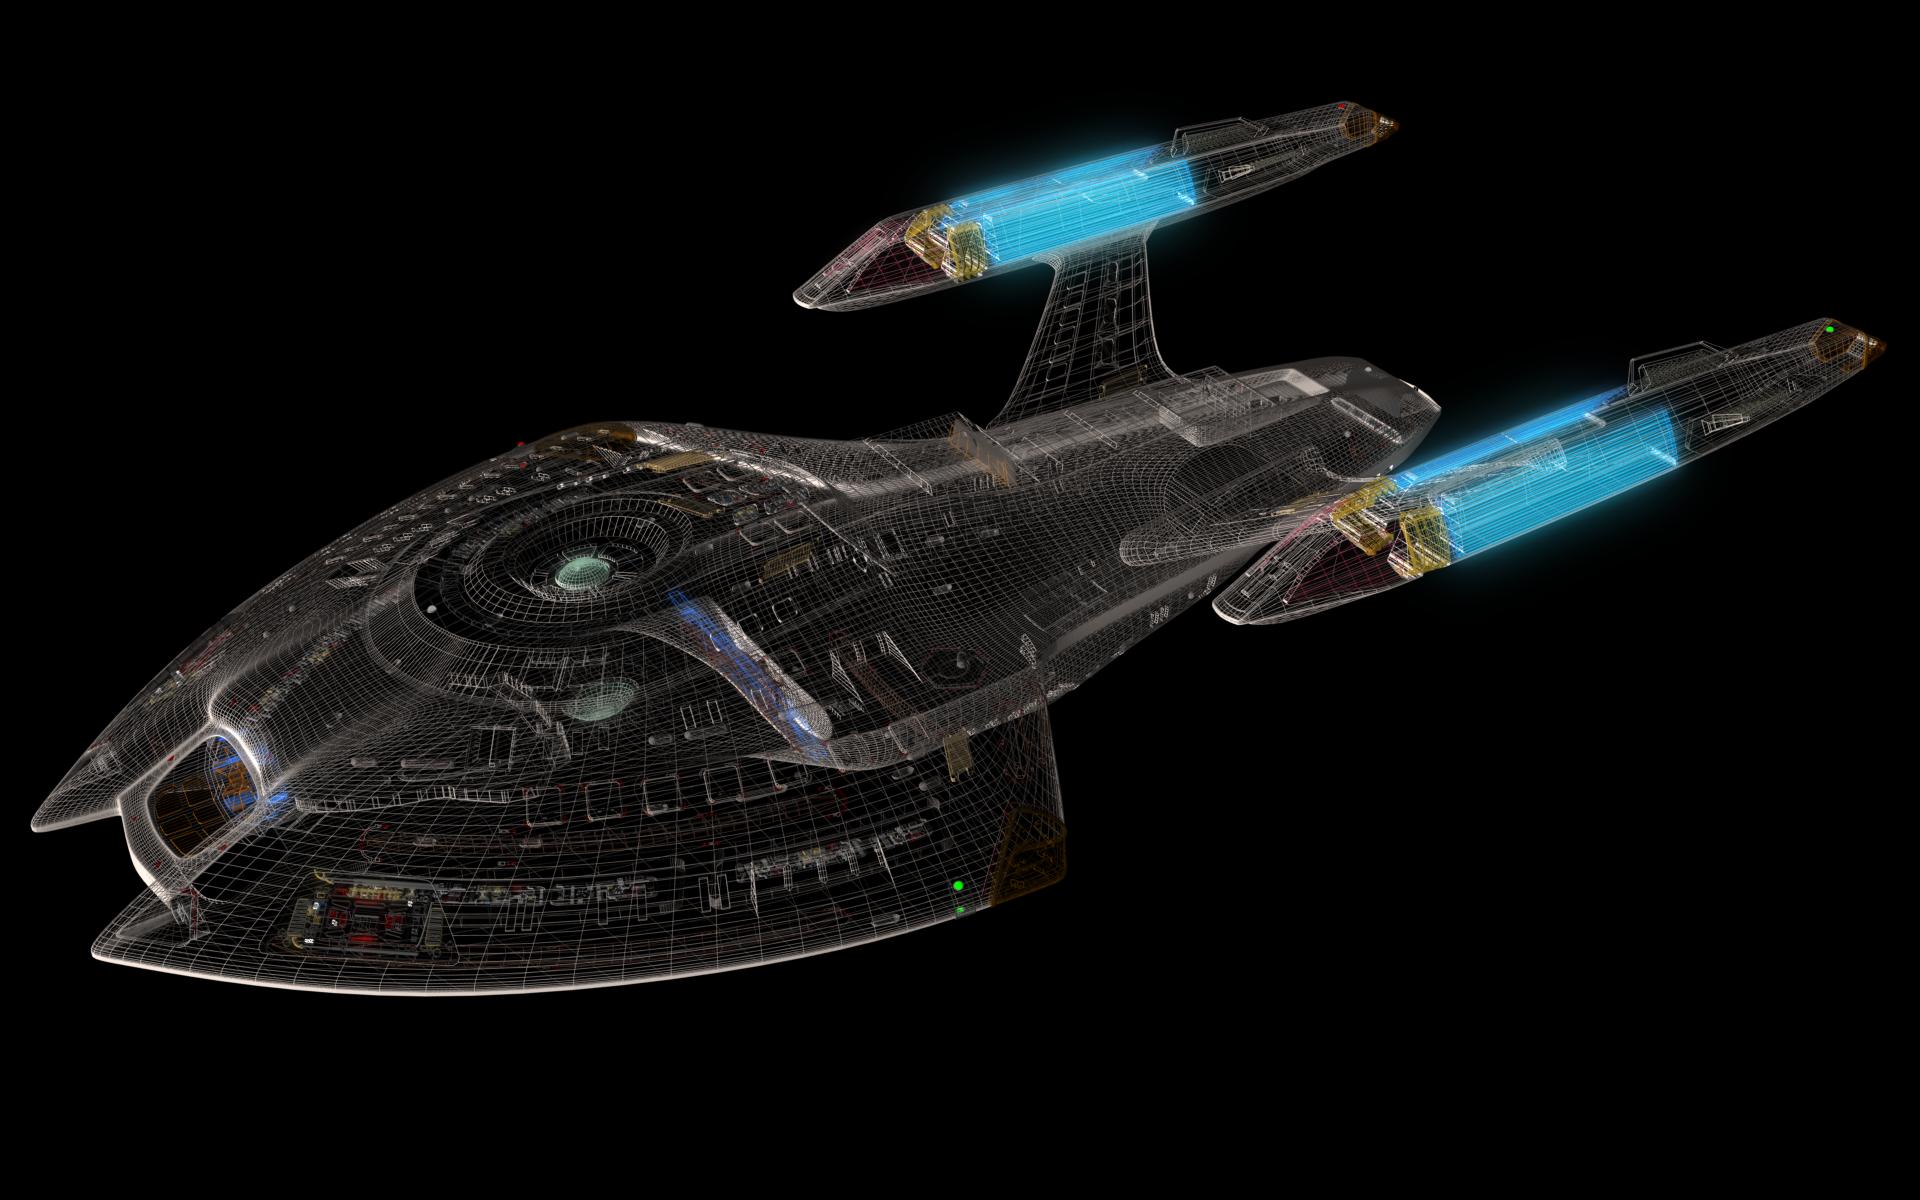 Star Trek starship Wallpaper 7155 1920x1200